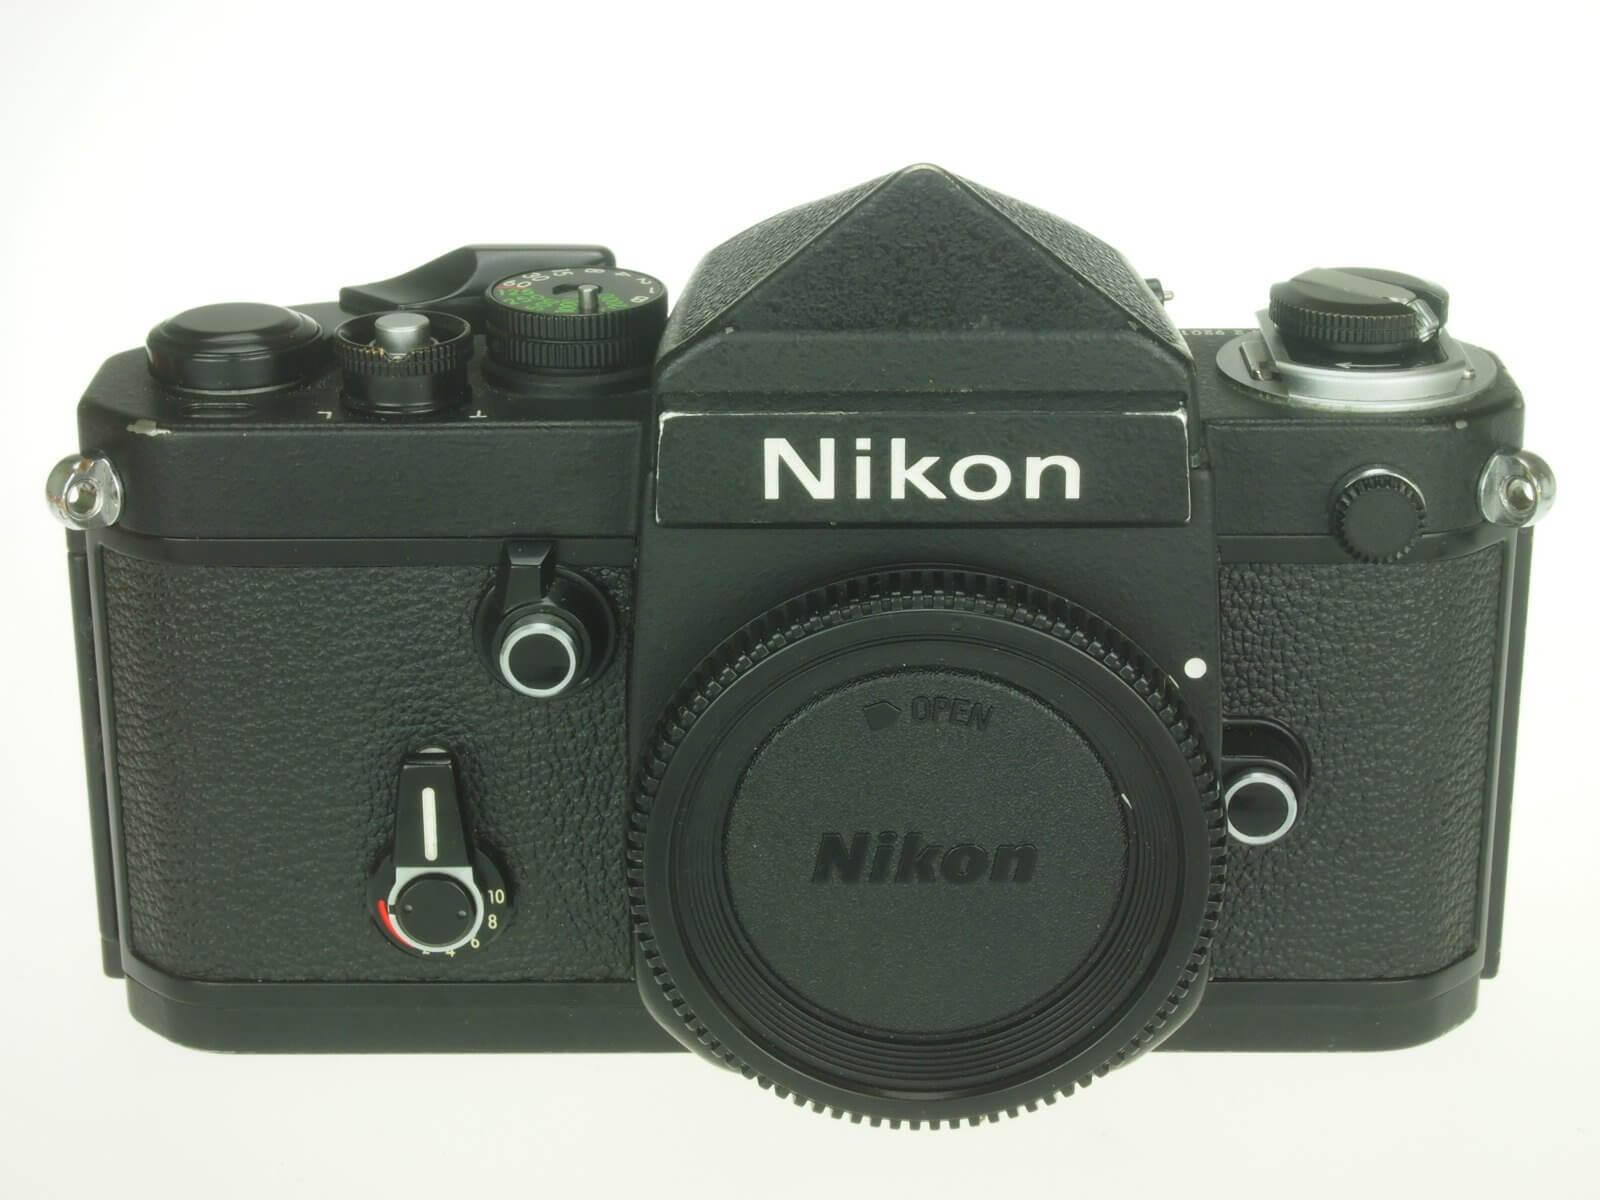 Nikon F2T body, no-name version, clean, with correct titanium prism